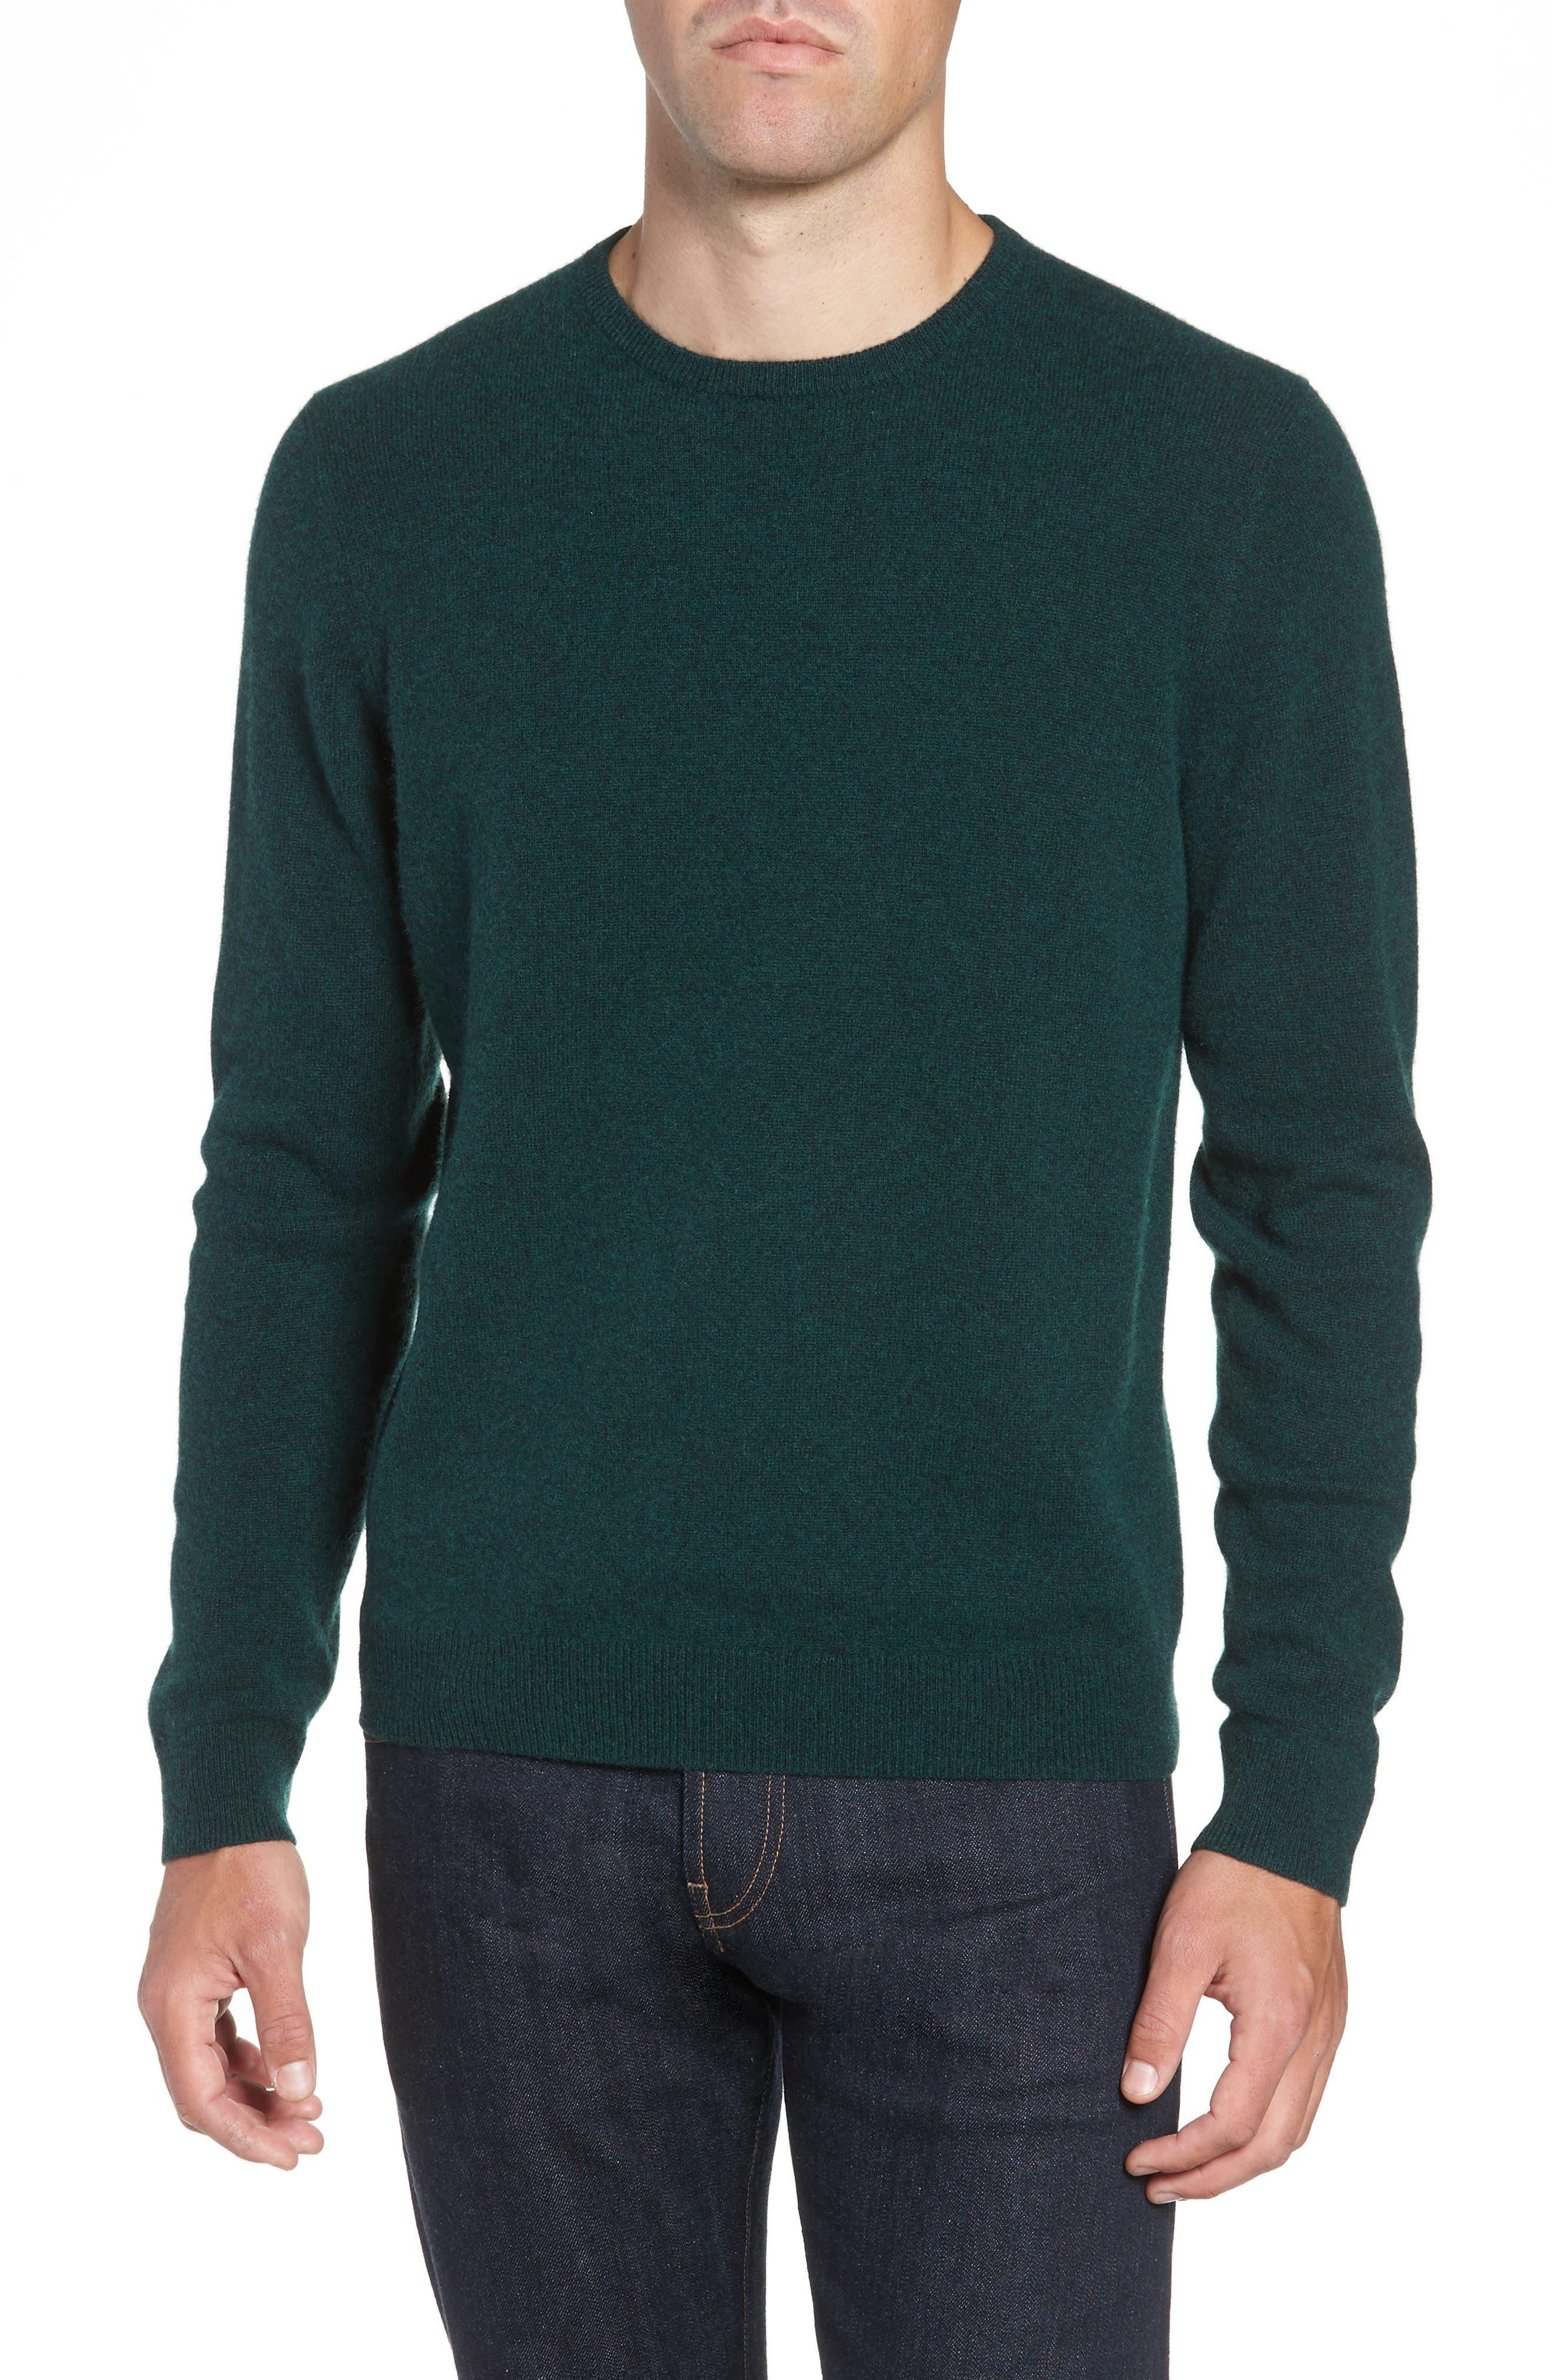 Nordstrom Shop Cashmere Crewneck Sweater, Green